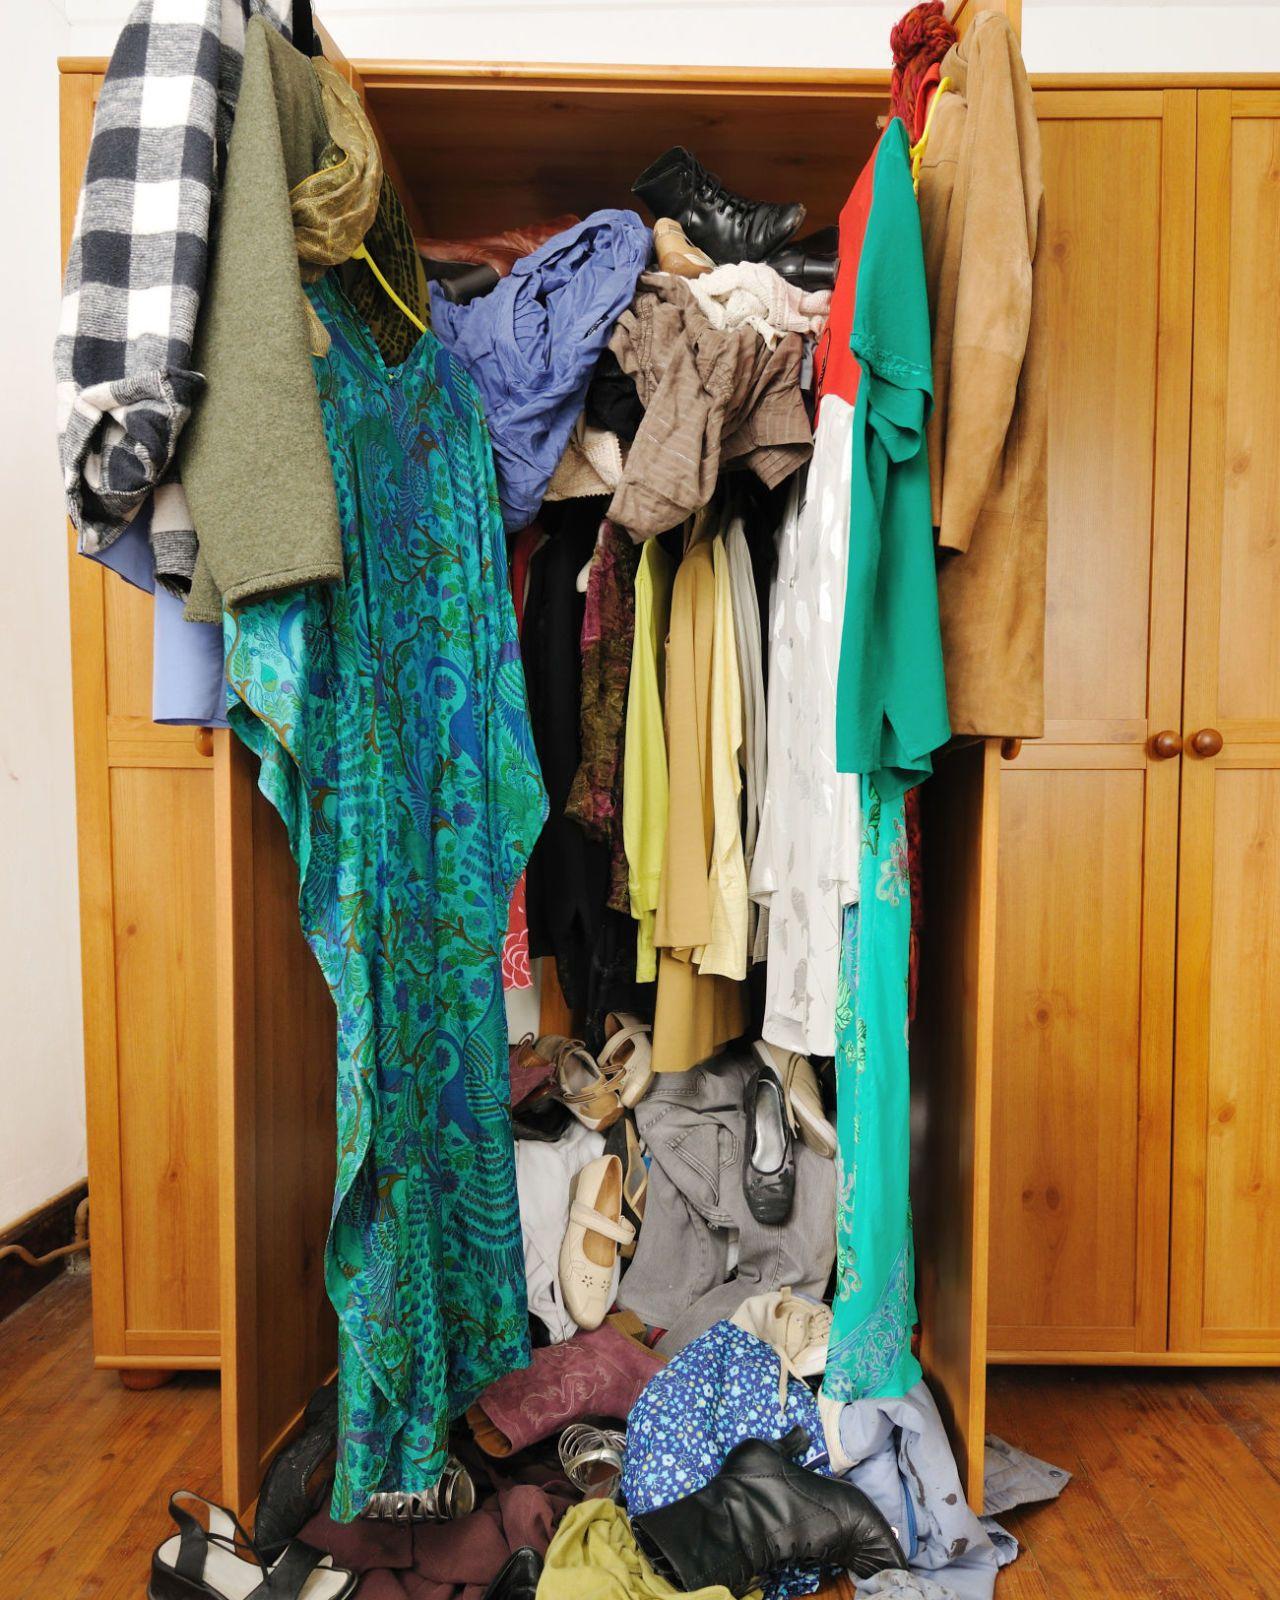 15 Closet Organization Ideas Youu0027ll Want To Steal Immediately